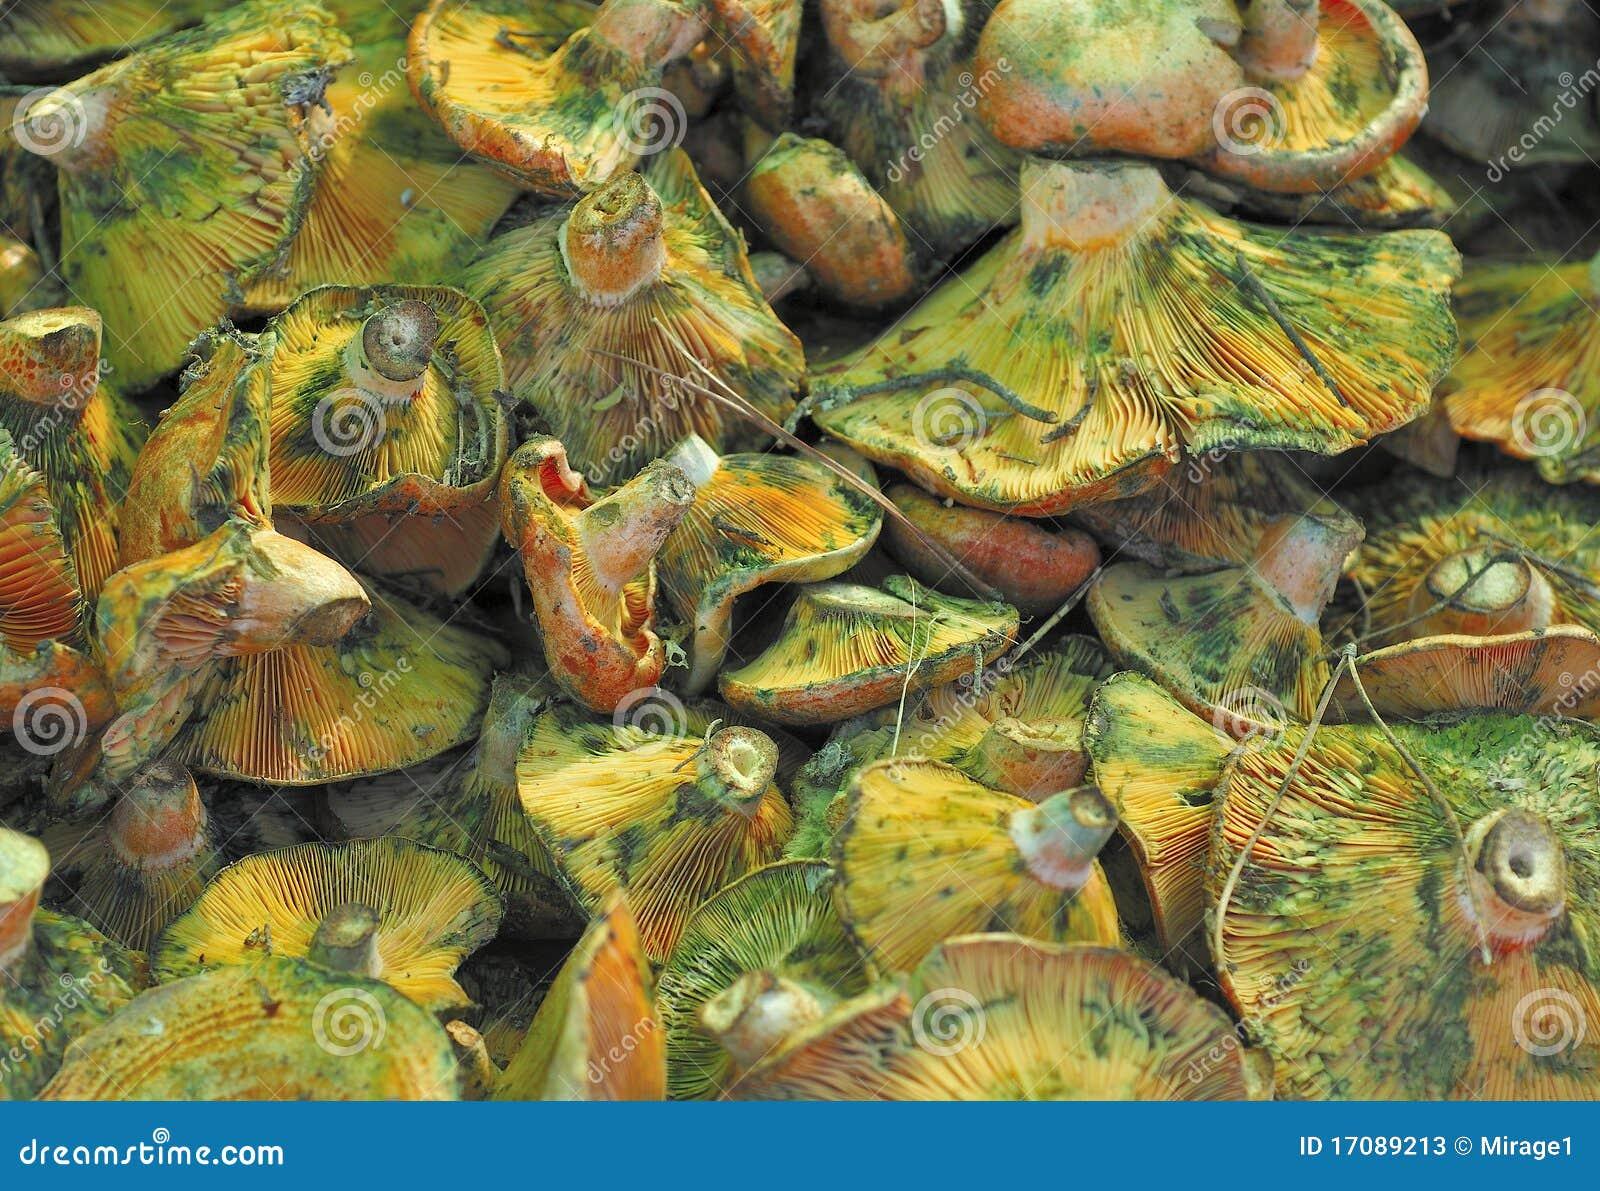 Lactarius- Deliciosuspilze